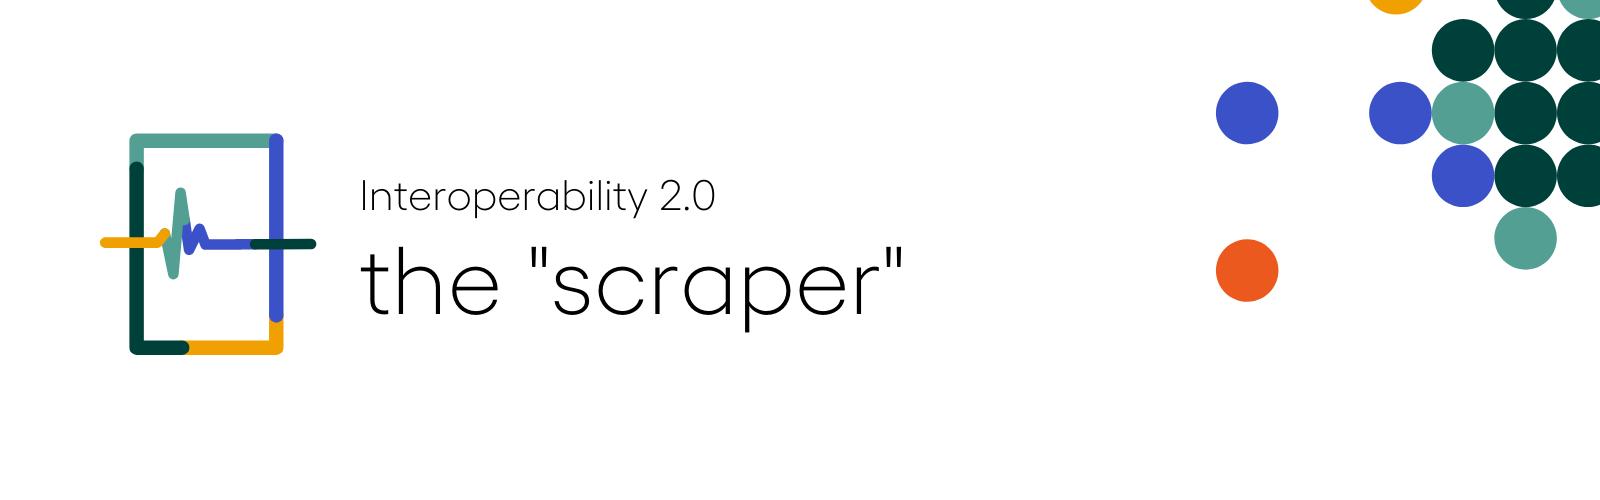 Interoperability 2.0